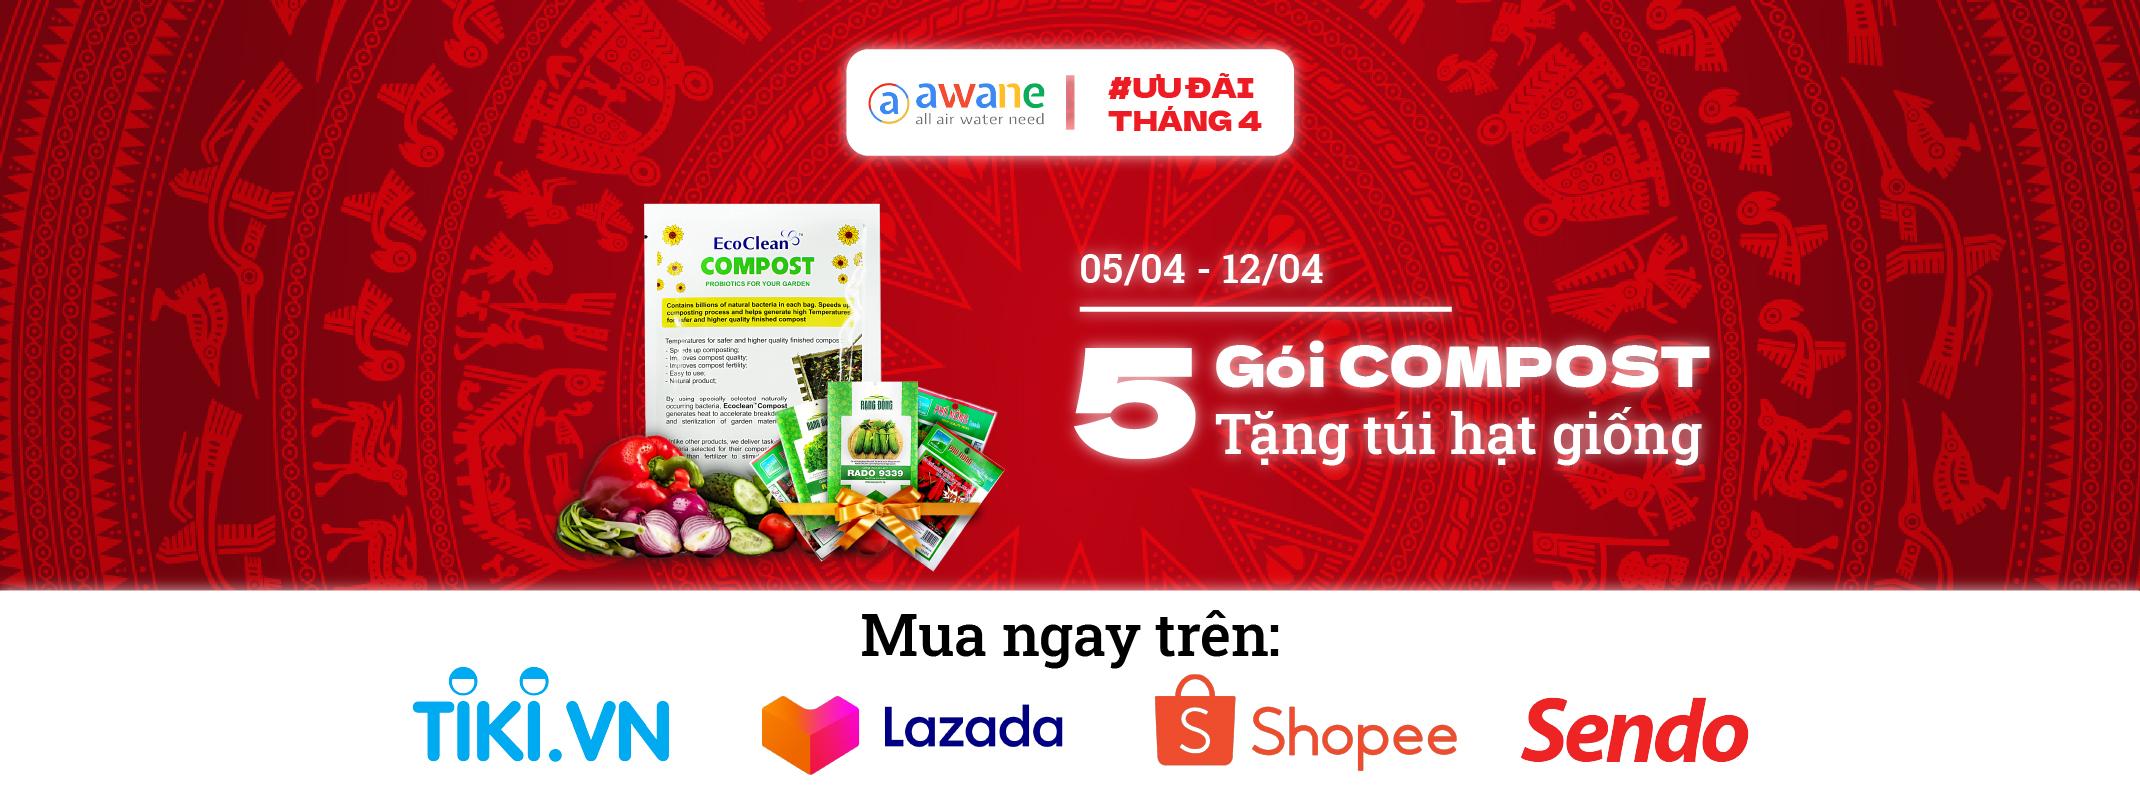 Tặng túi hạt giống khi mua combo 5 gói EcoClean Compost - #UuDaiThang4